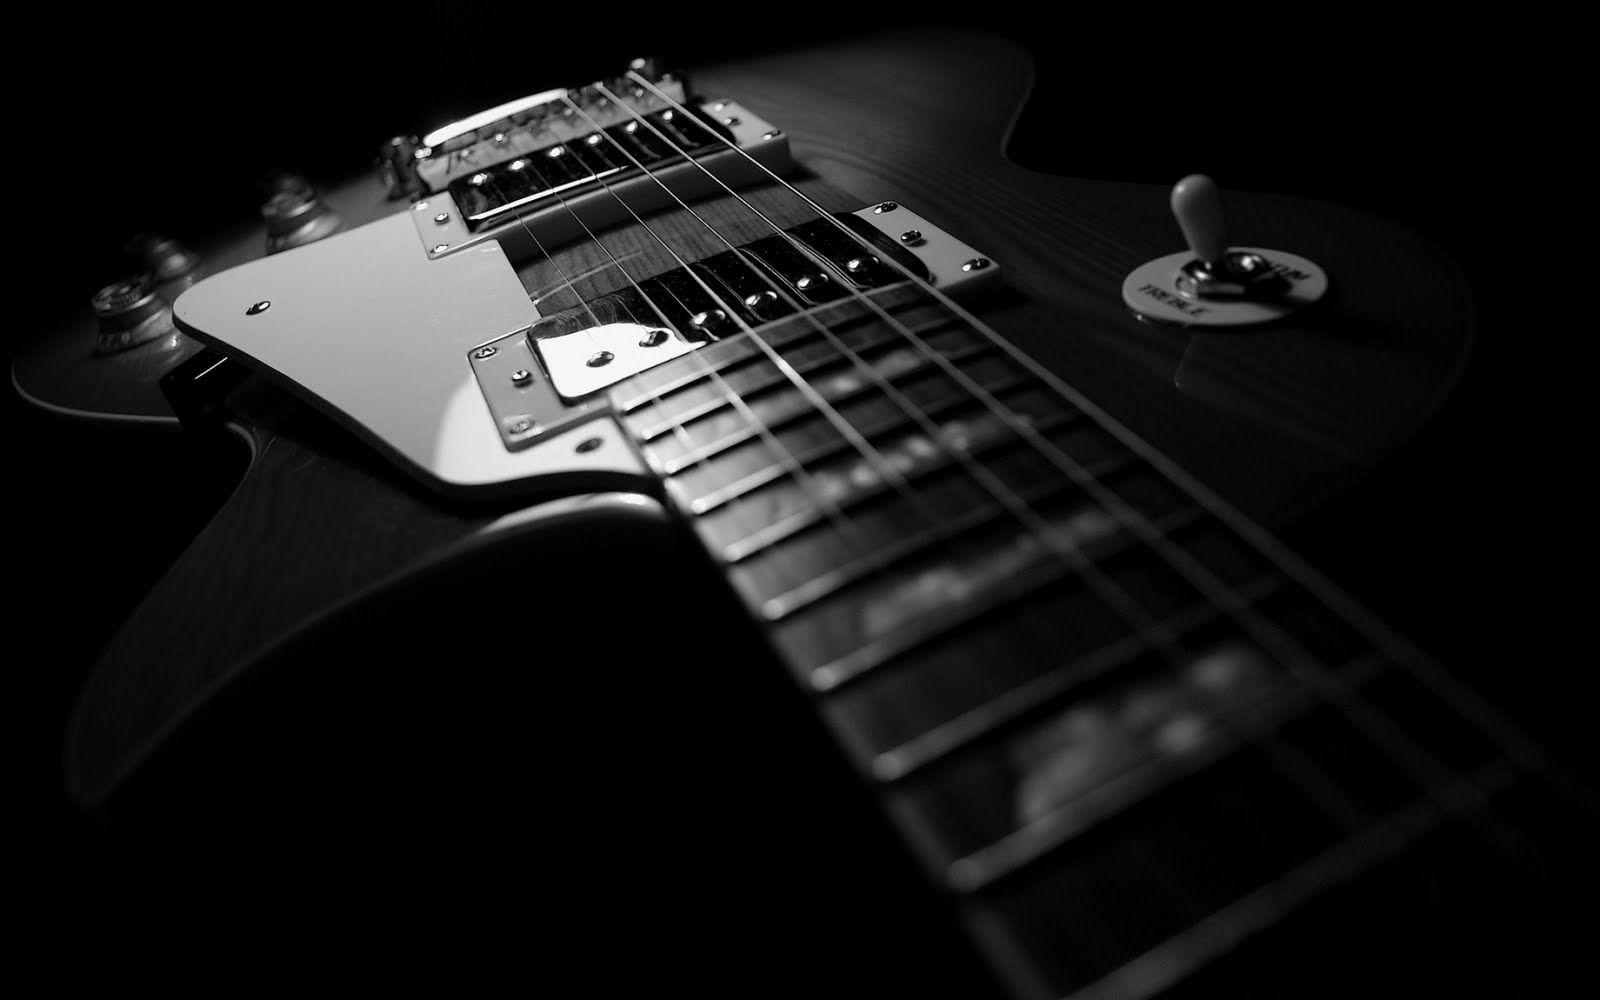 Wallpapers Musica Guitarra Rocknroll Wallpapers Photo